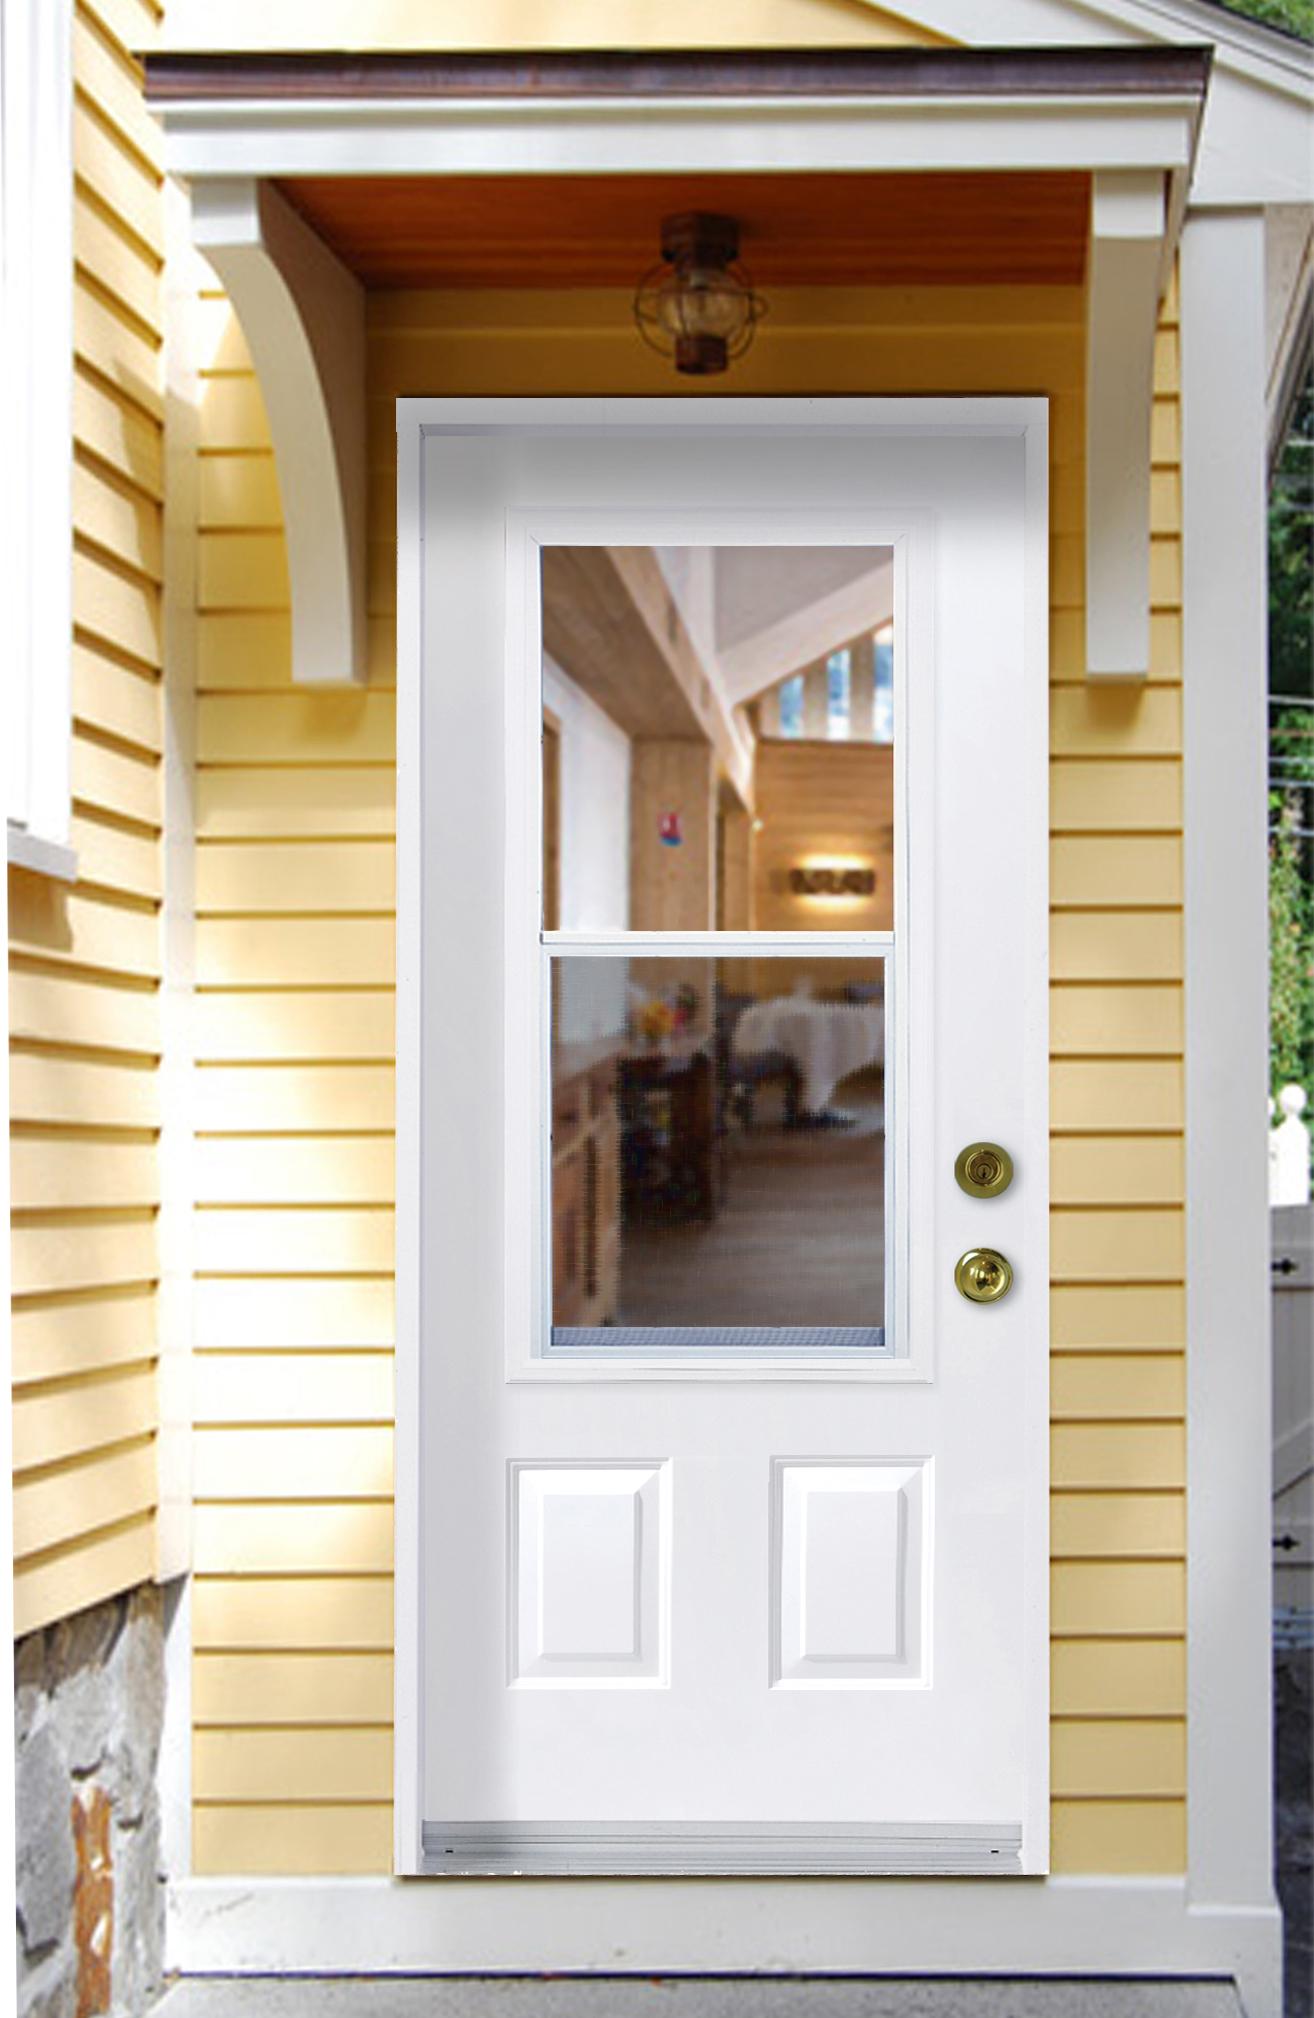 unit vitr e guillotine portatec fabricant de porte d. Black Bedroom Furniture Sets. Home Design Ideas